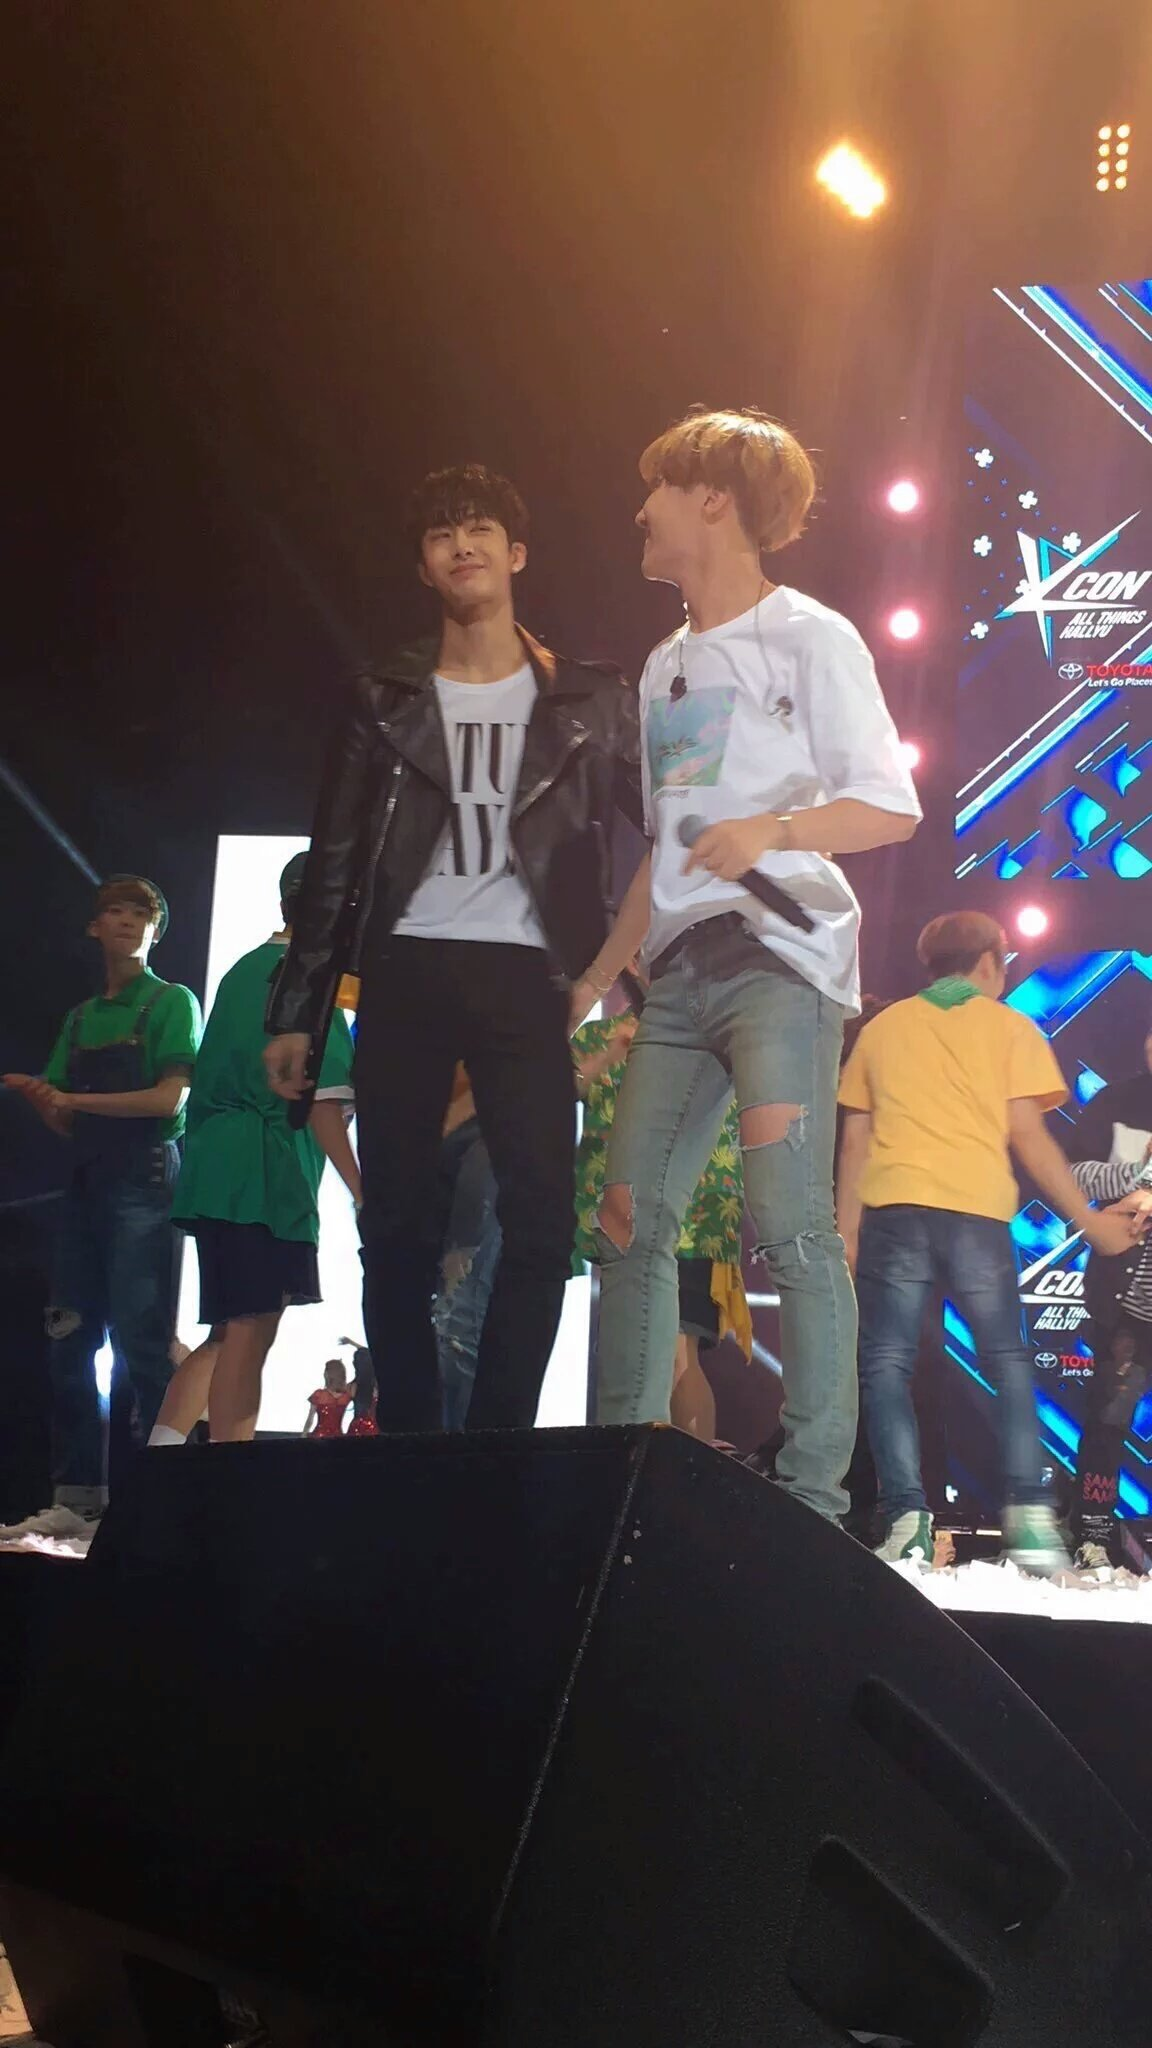 2 bts jhope hoseok monsta x hyungwon @Maylily_BTS